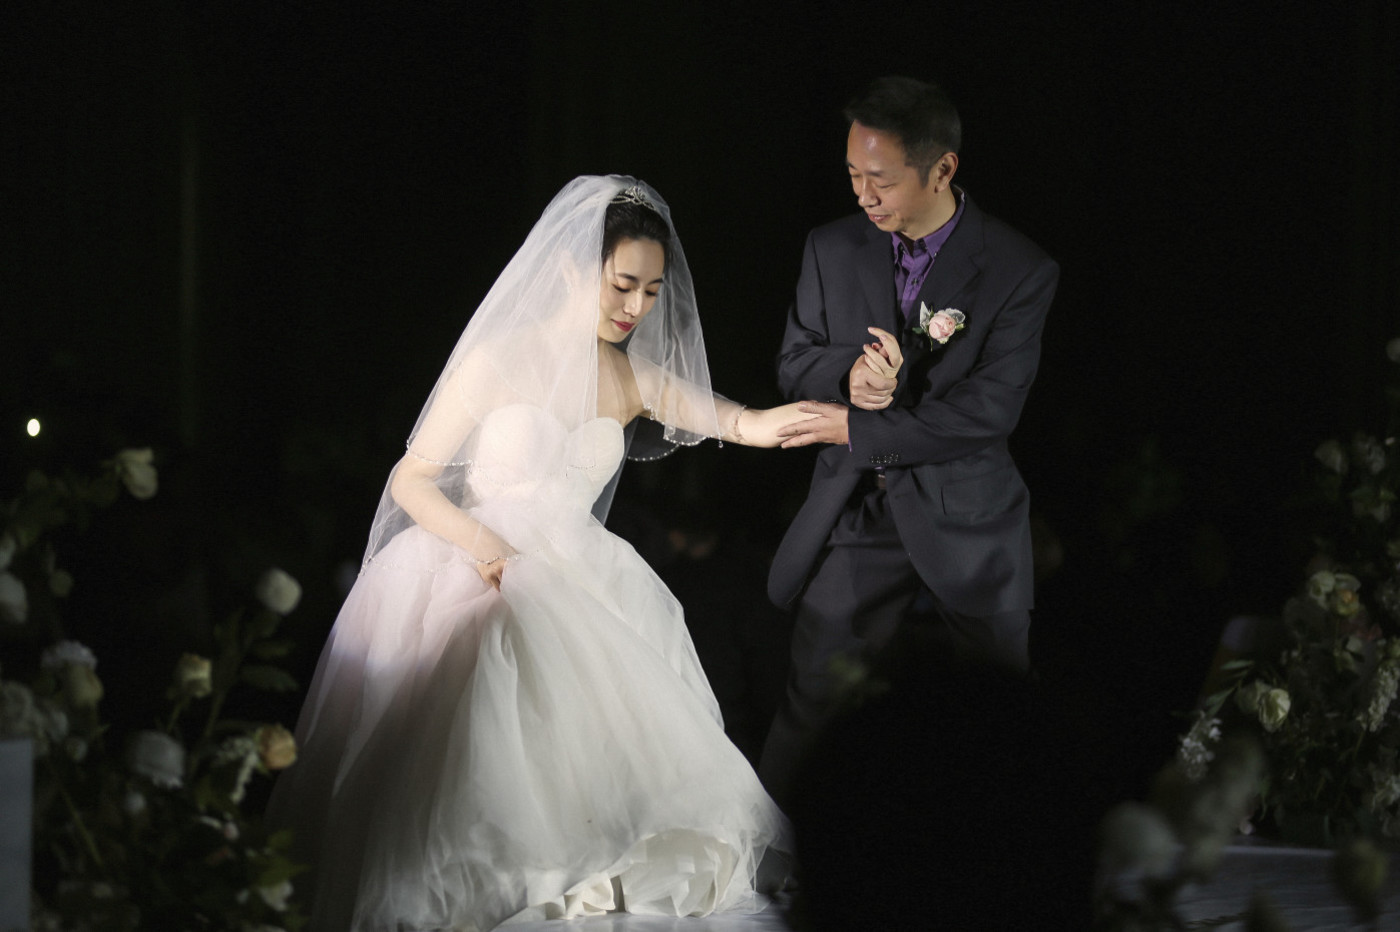 【KAI 婚礼纪实】Z&Y 常州婚礼25